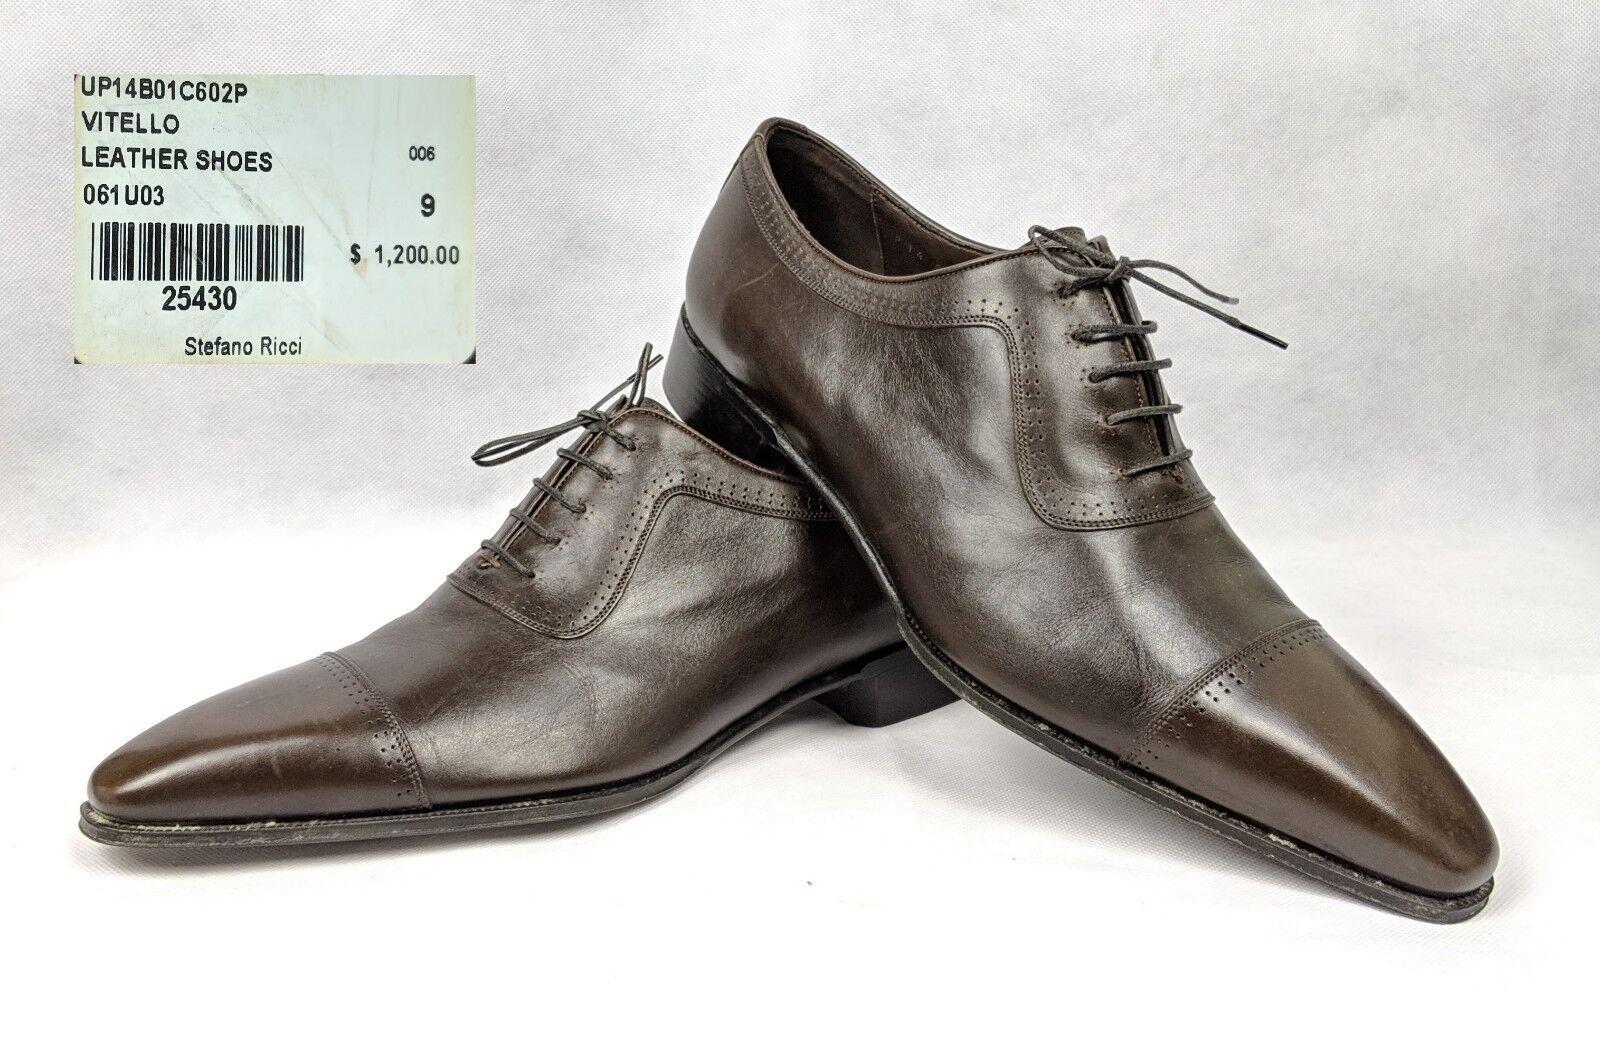 100% Authentic STEFANO RICCI Vitello Leather Cap Toe shoes 9  US10  43 NEW  1200